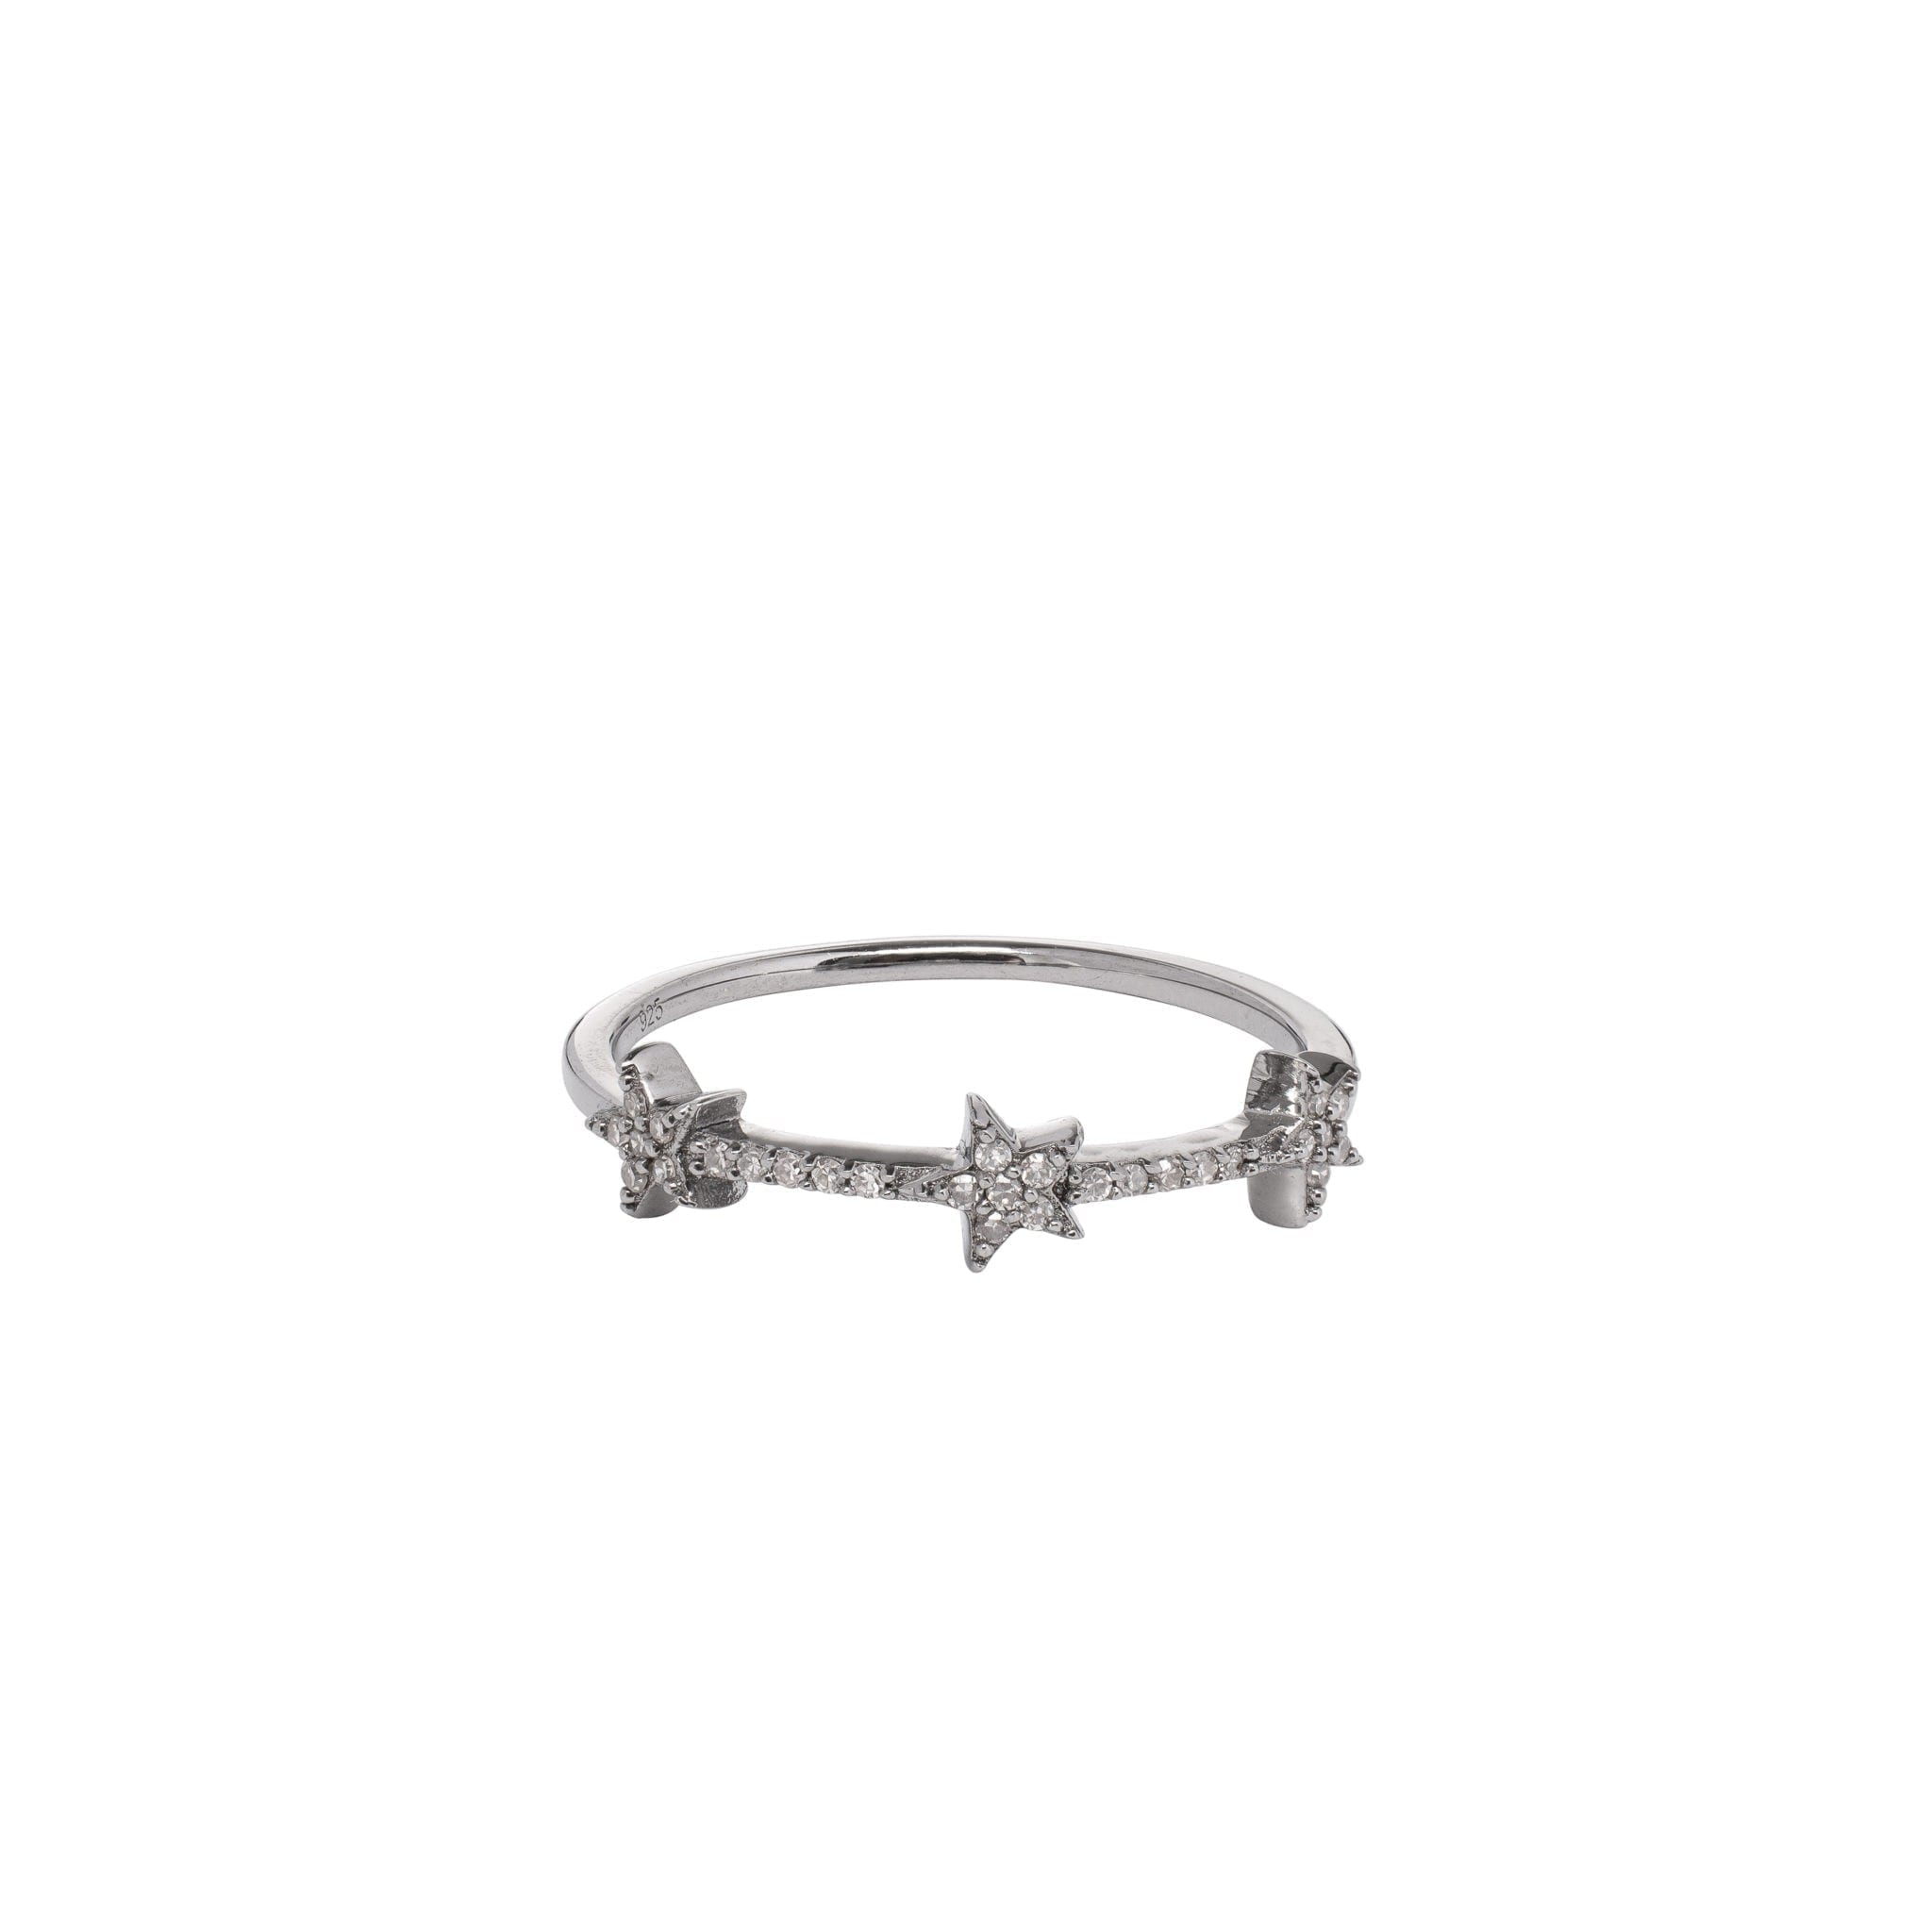 3 Star Mini Diamond Ring Sterling Silver